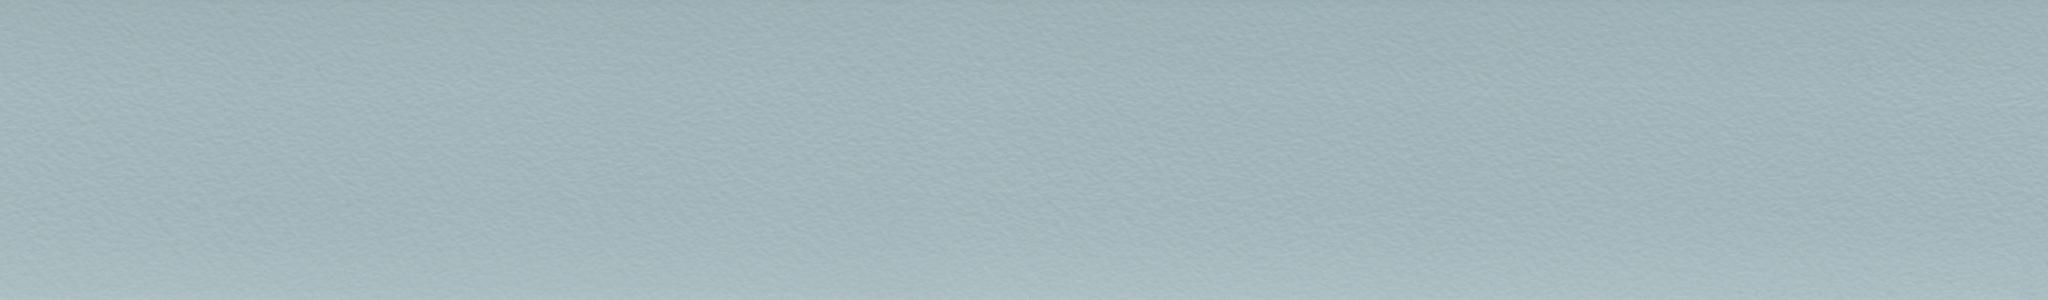 HU 16636 ABS hrana zelená perla XG